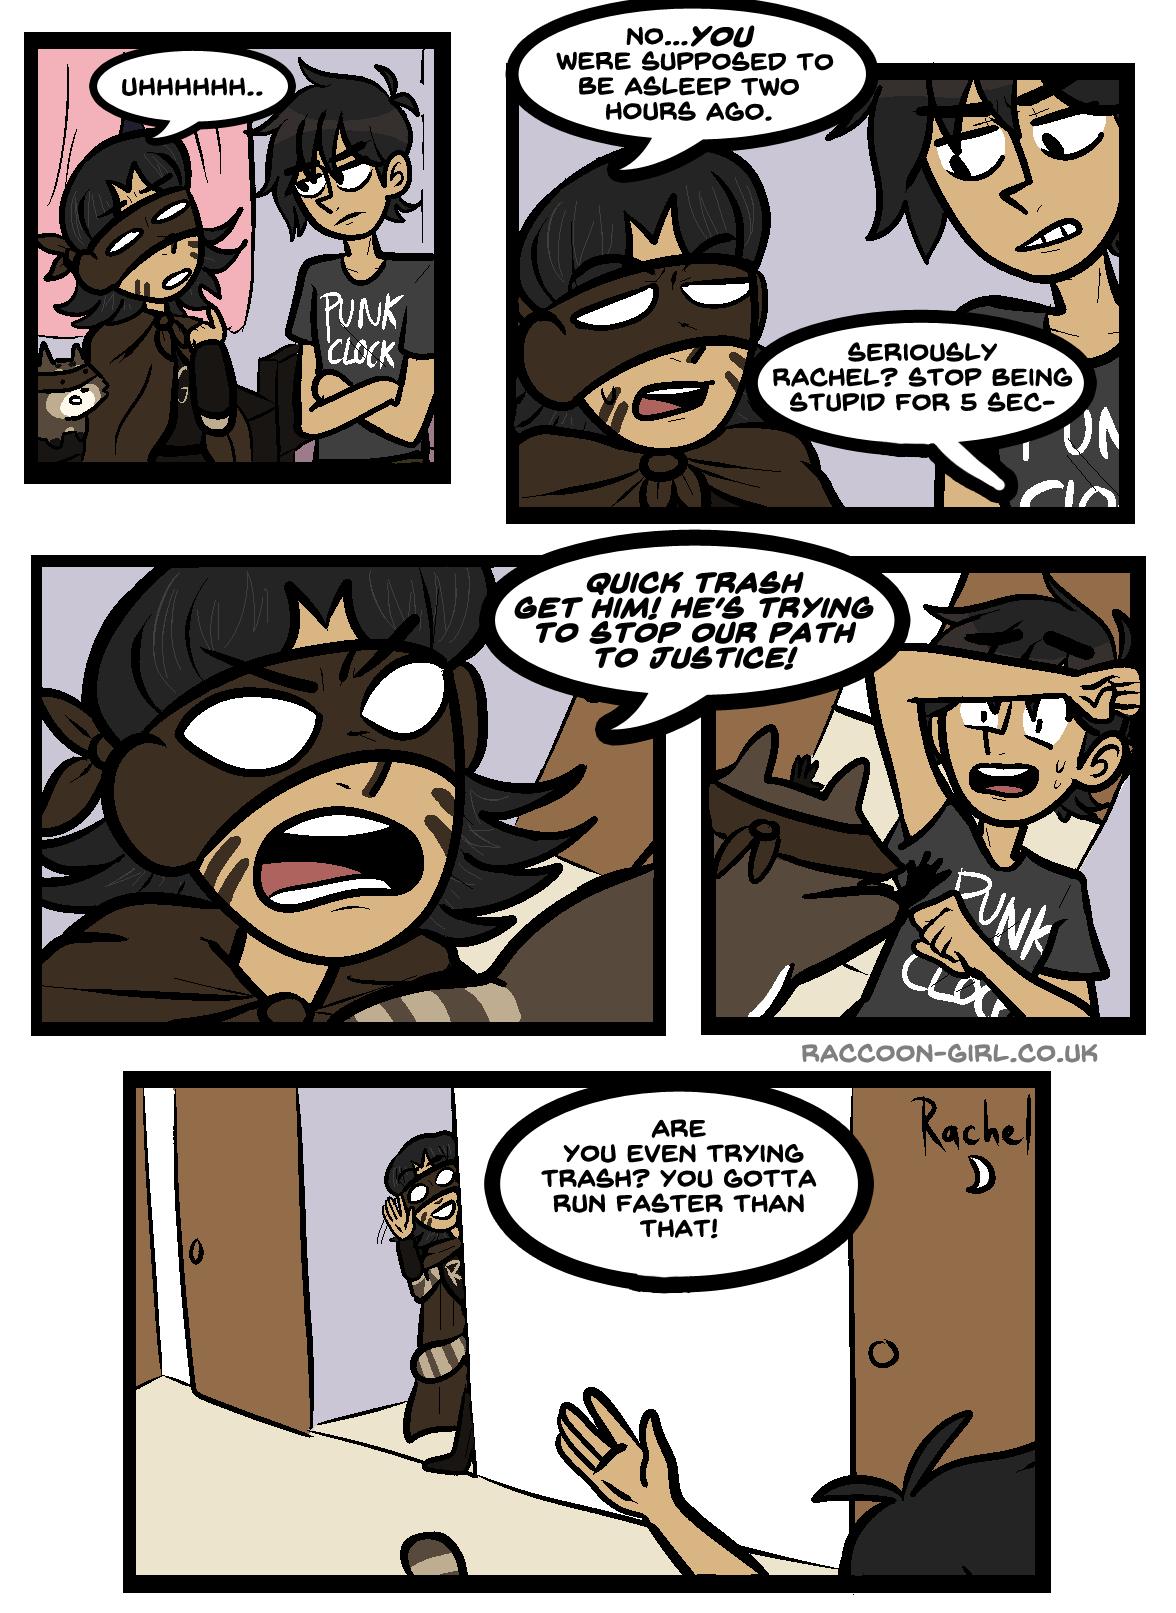 Rabies sucks